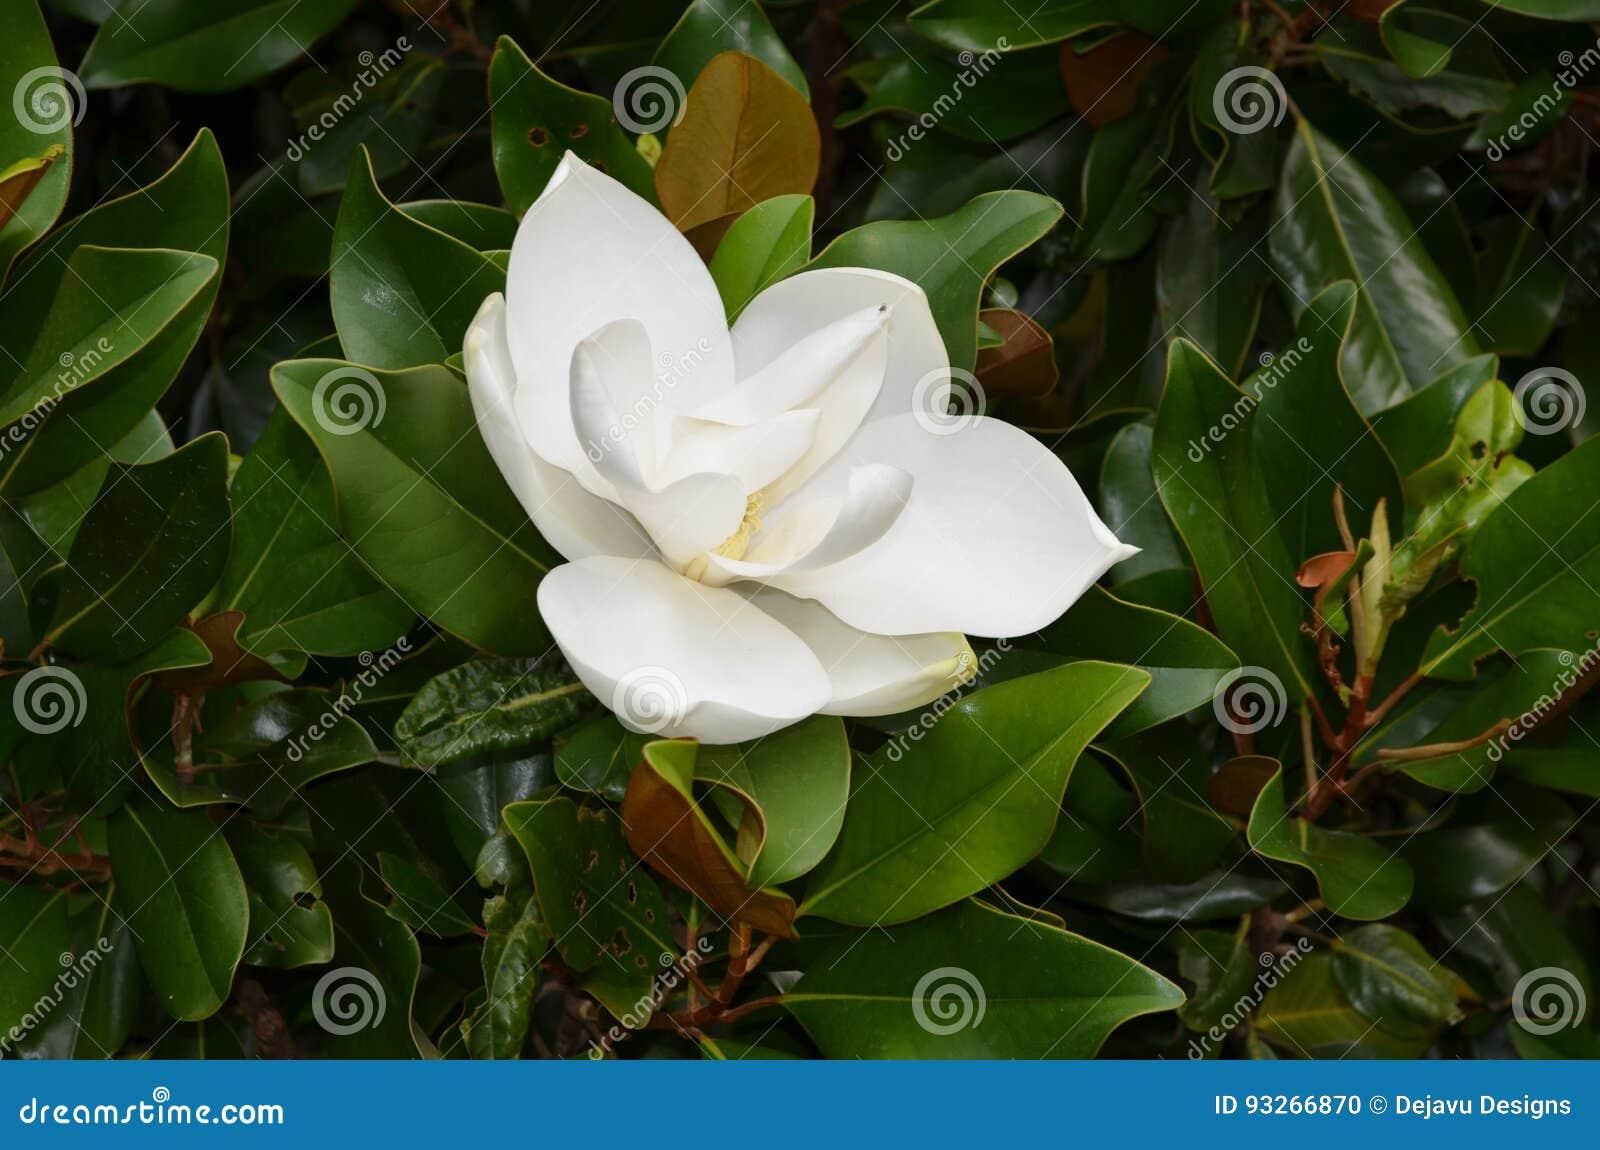 Pretty Flowering White Magnolia Bush With A Flower Blossom Stock